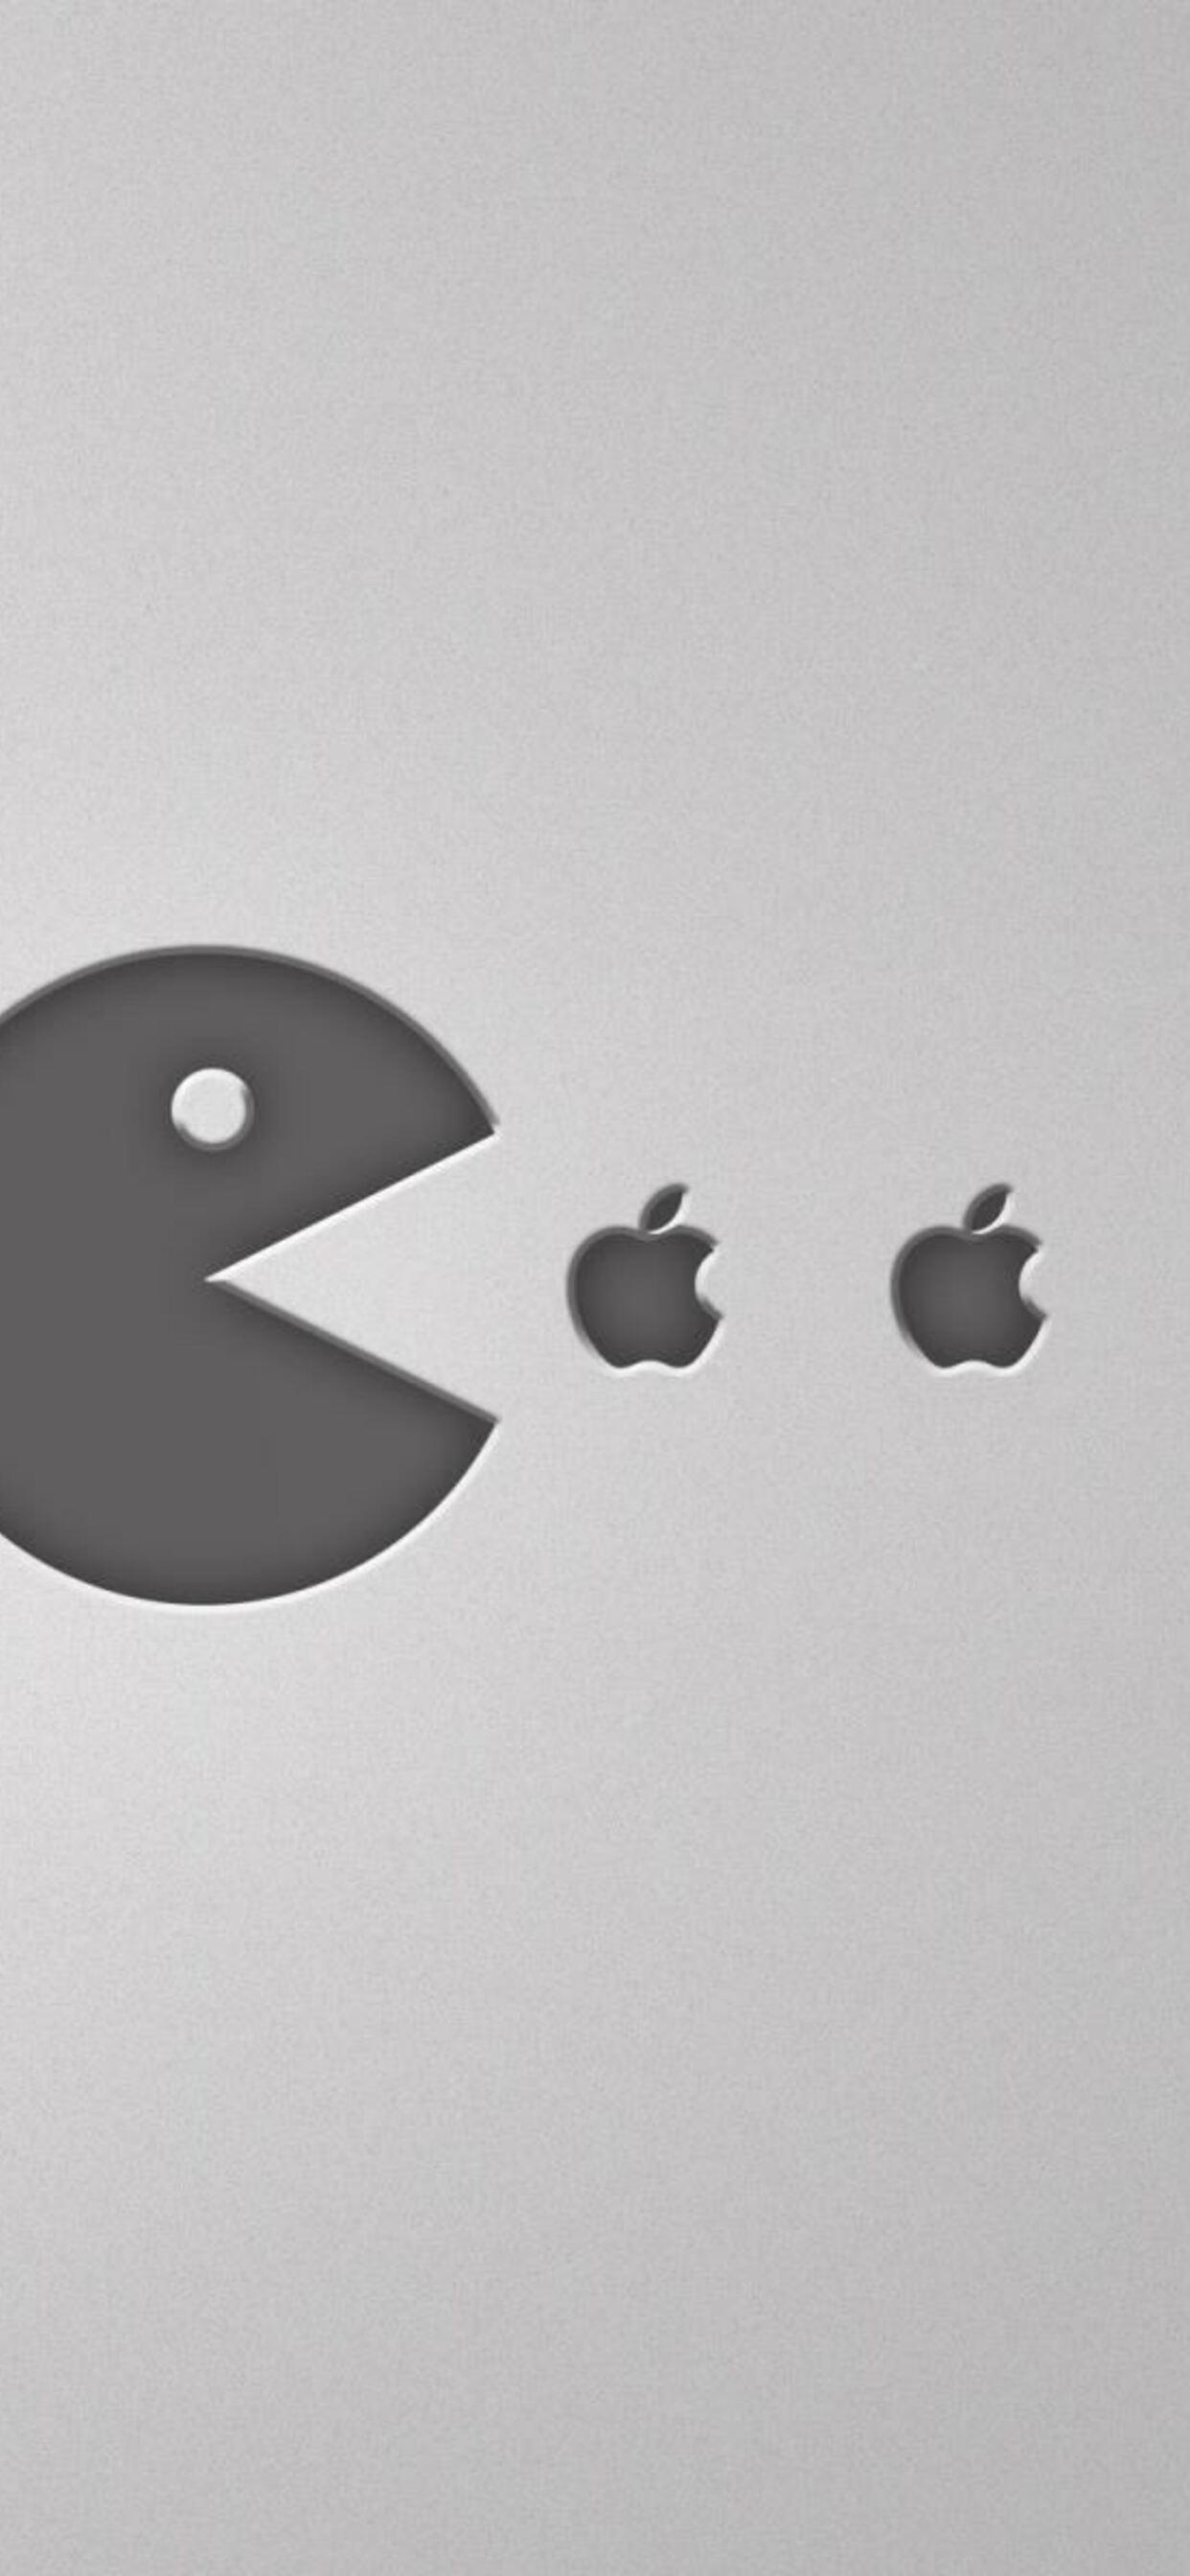 pacman-apple-minimalism-img.jpg